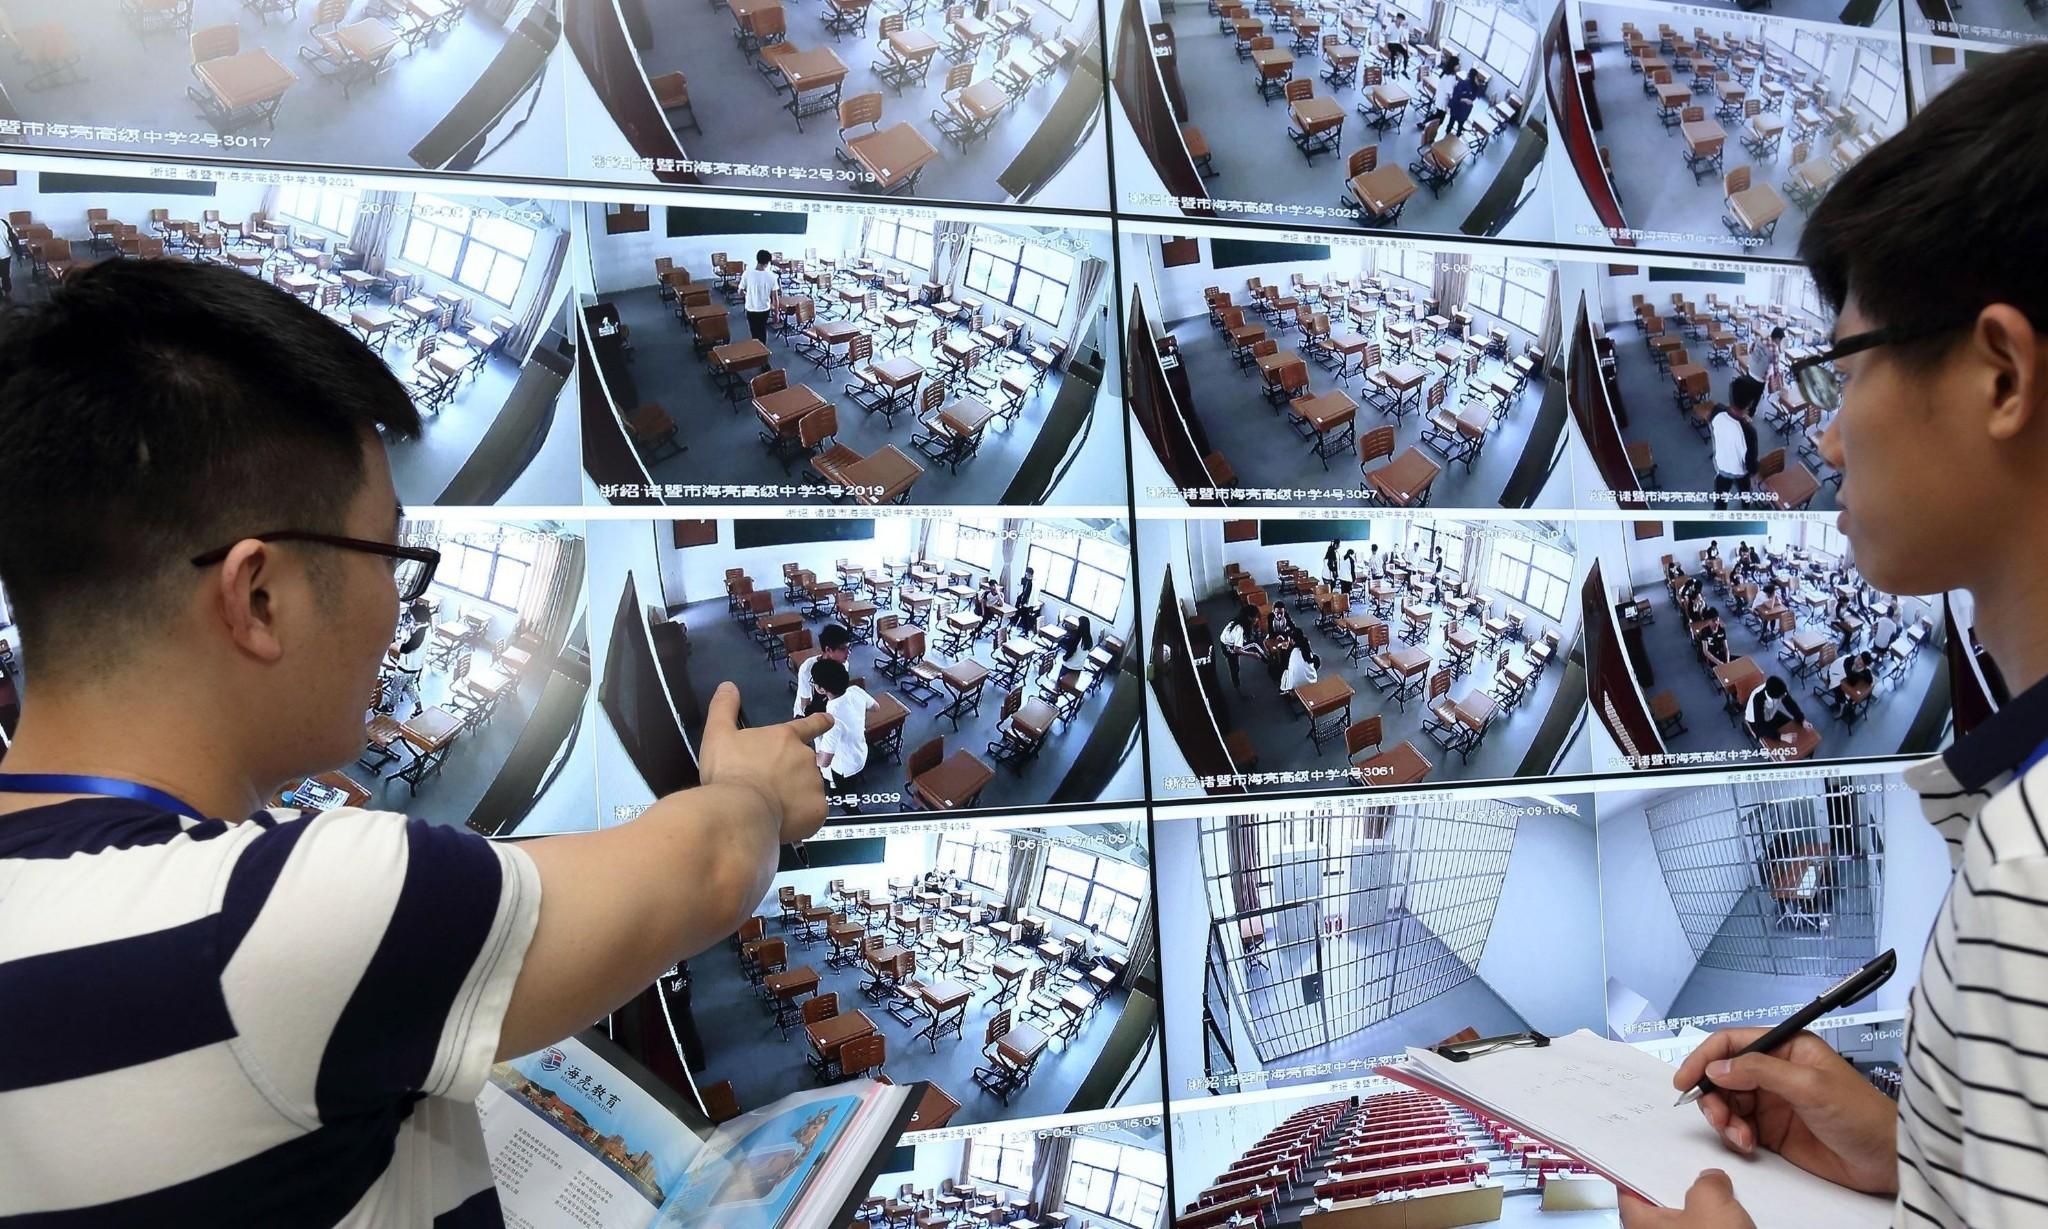 Is China's gaokao the world's toughest school exam?